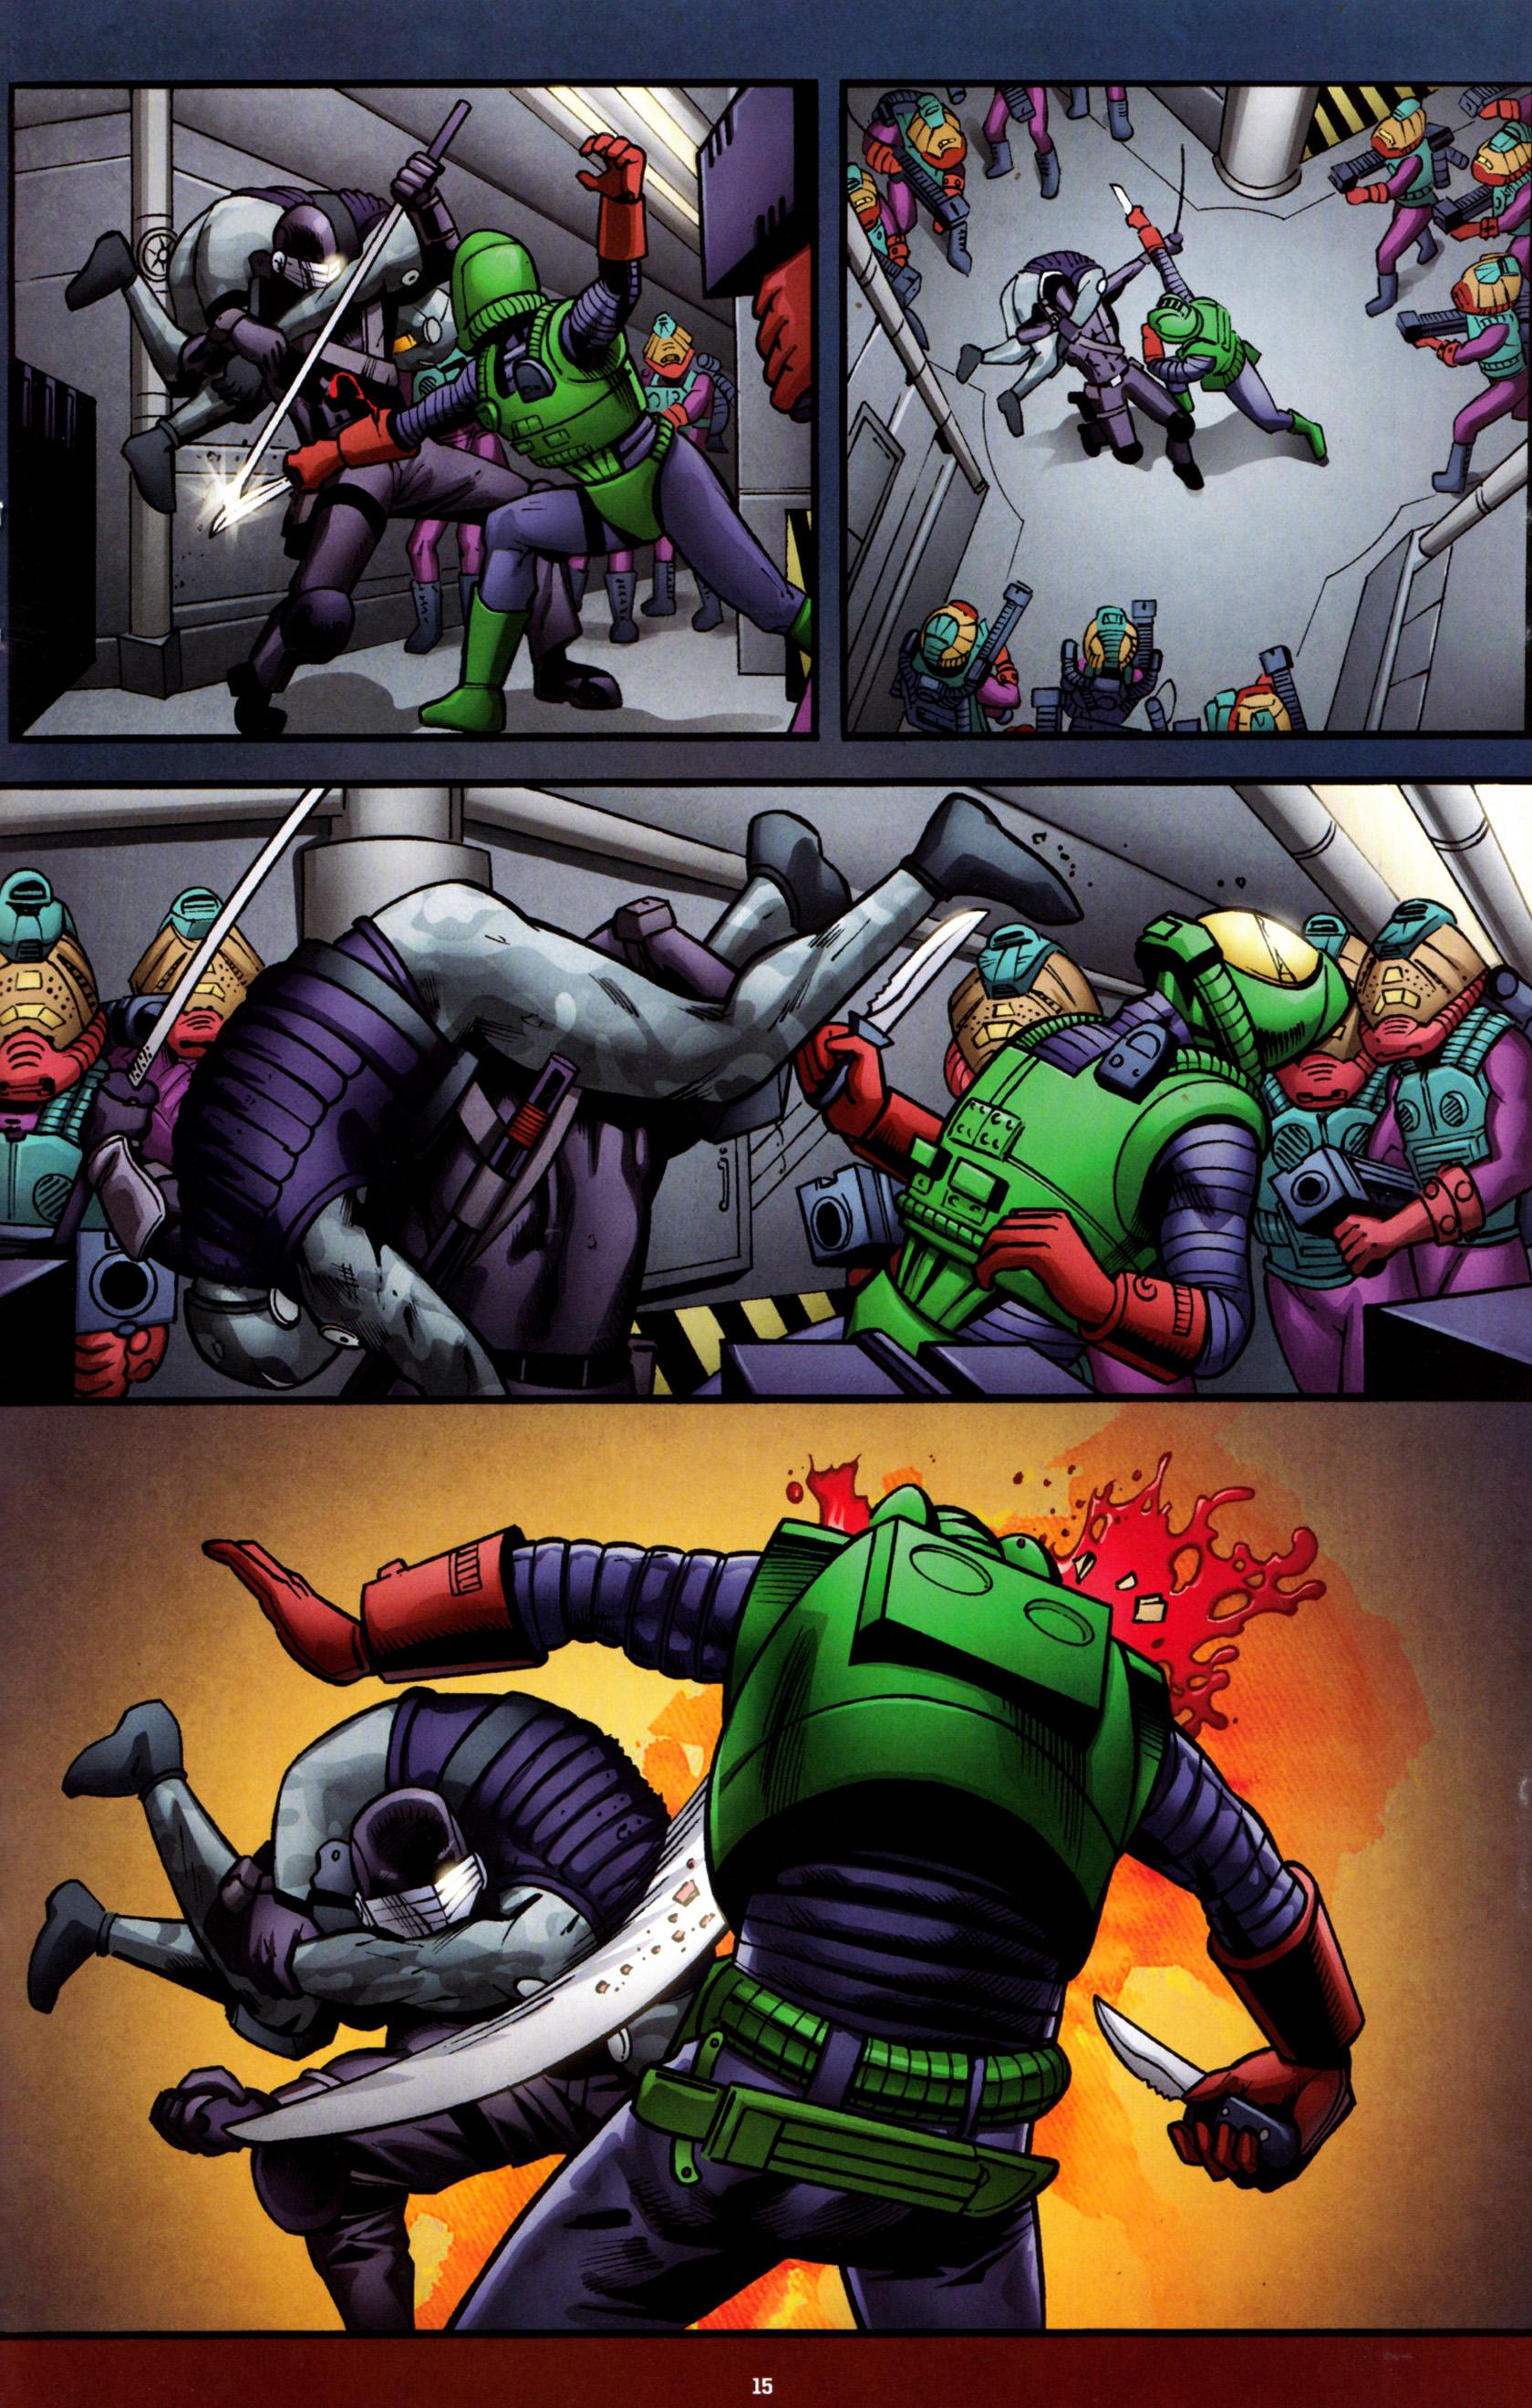 Read online G.I. Joe: Snake Eyes comic -  Issue #8 - 18